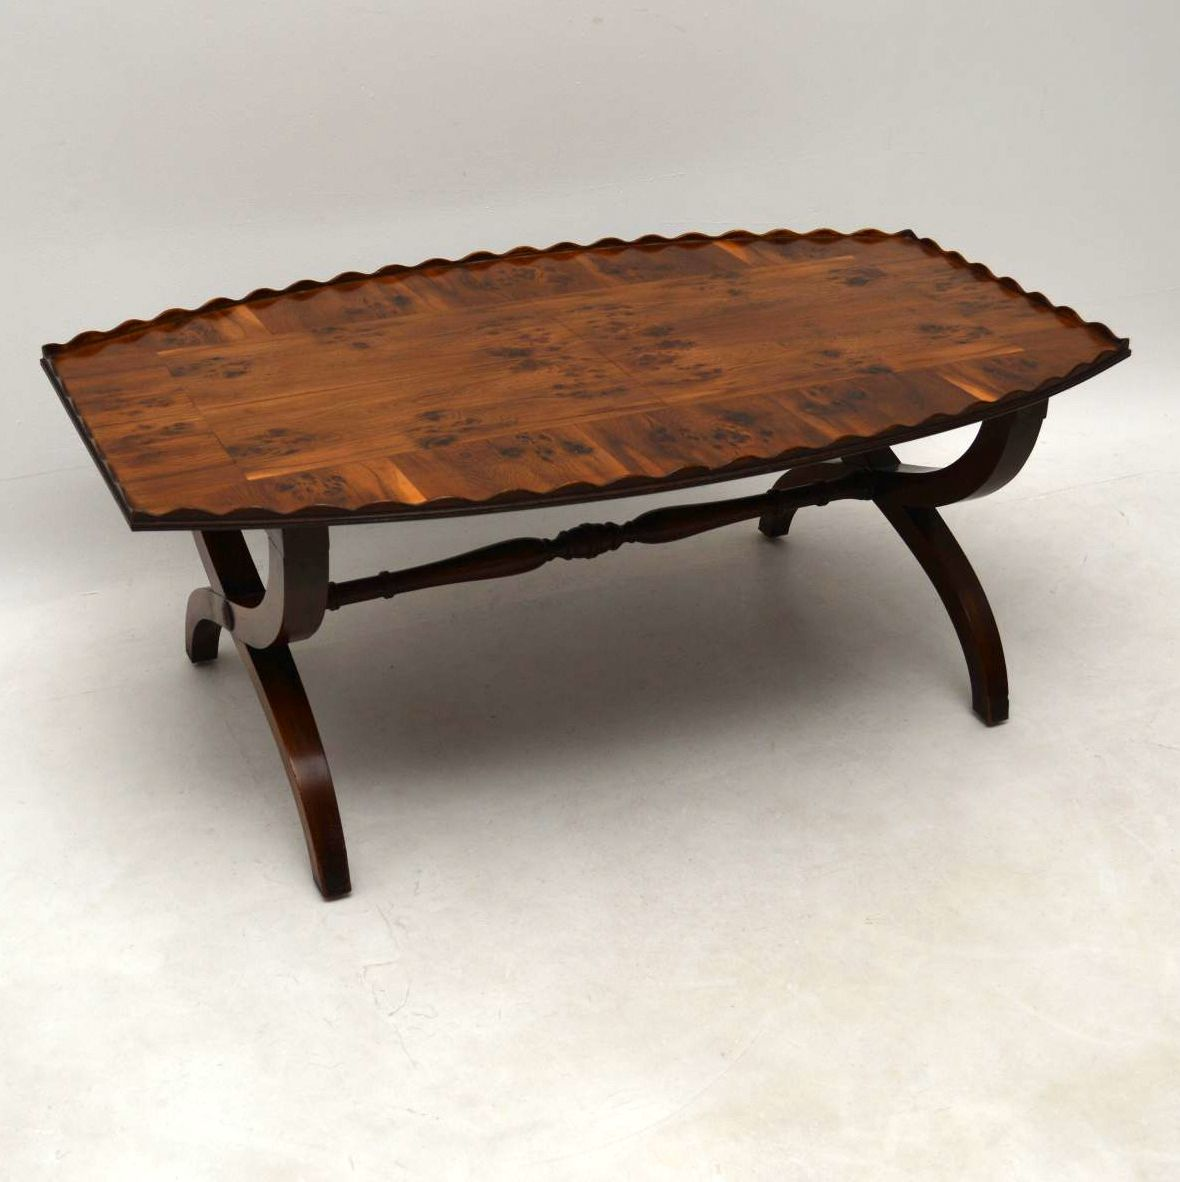 Antique Yew Wood & Oyster Veneer Coffee Table